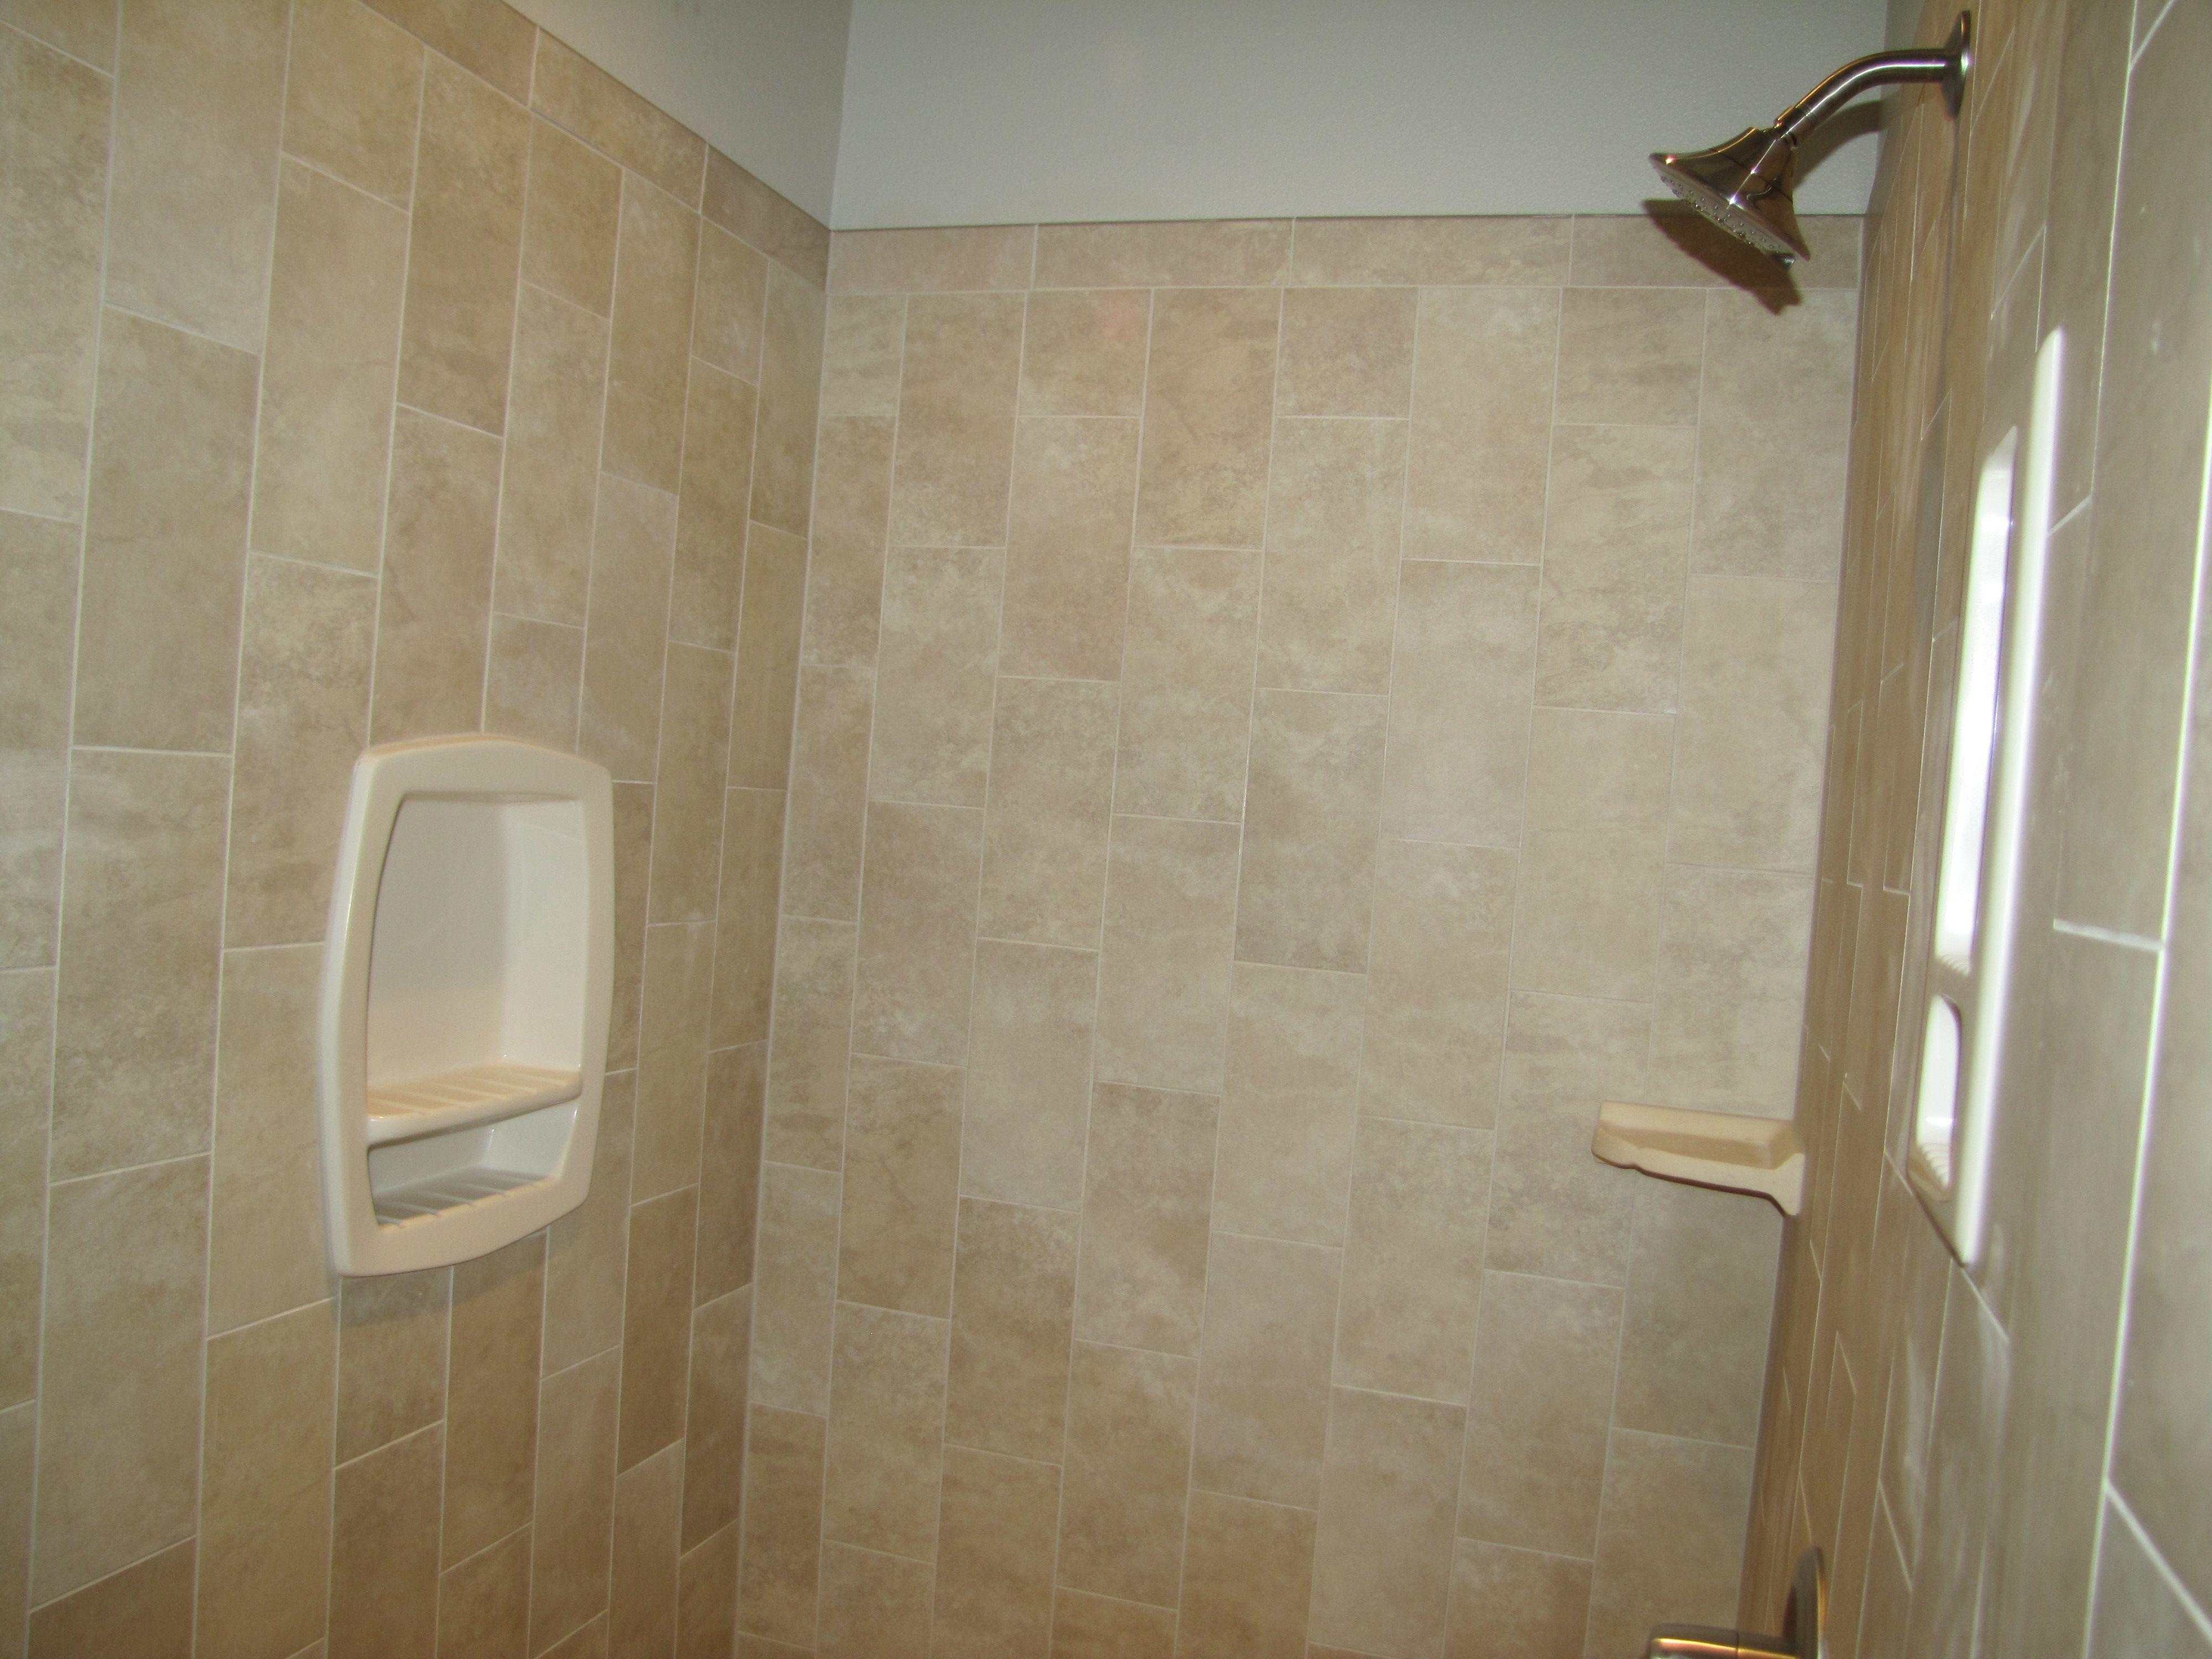 Shower Tile Work : Tile showers photos joy studio design gallery best